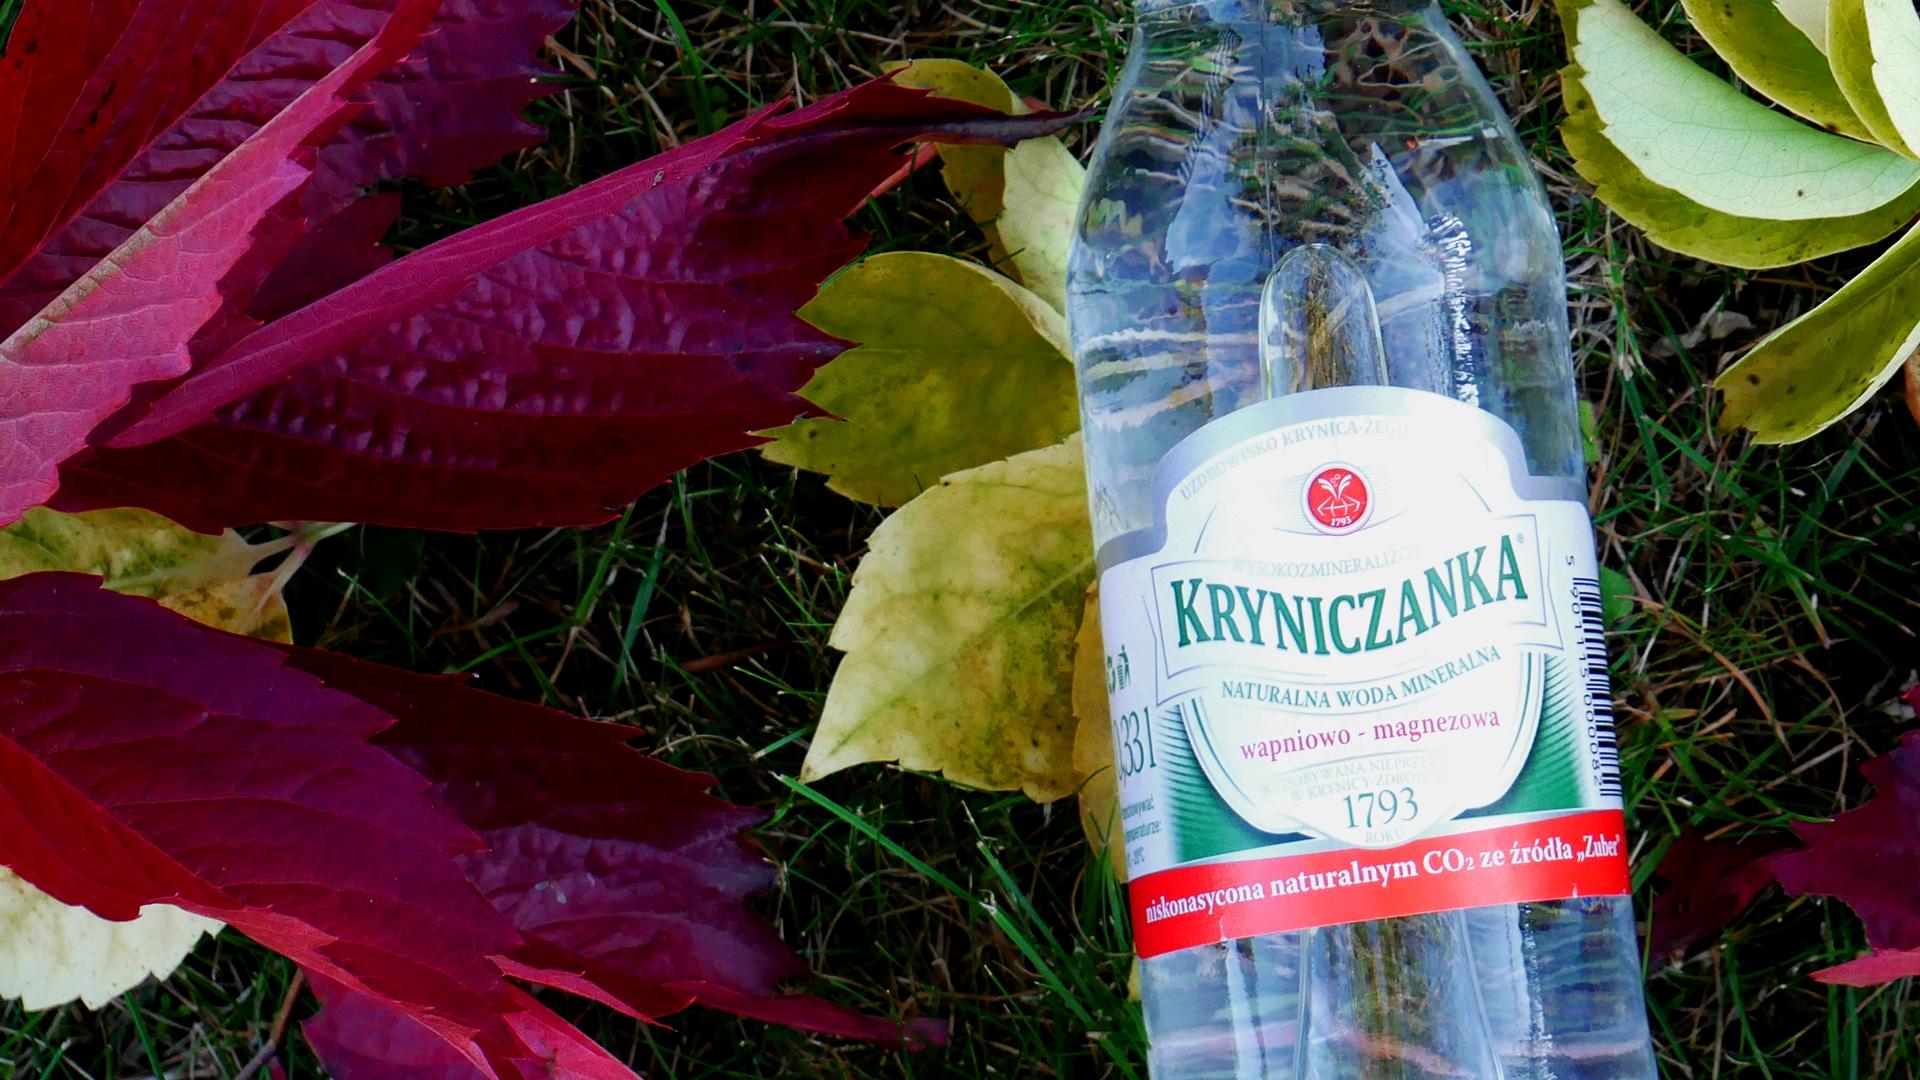 Kryniczanka - Naturalna Woda Mineralna